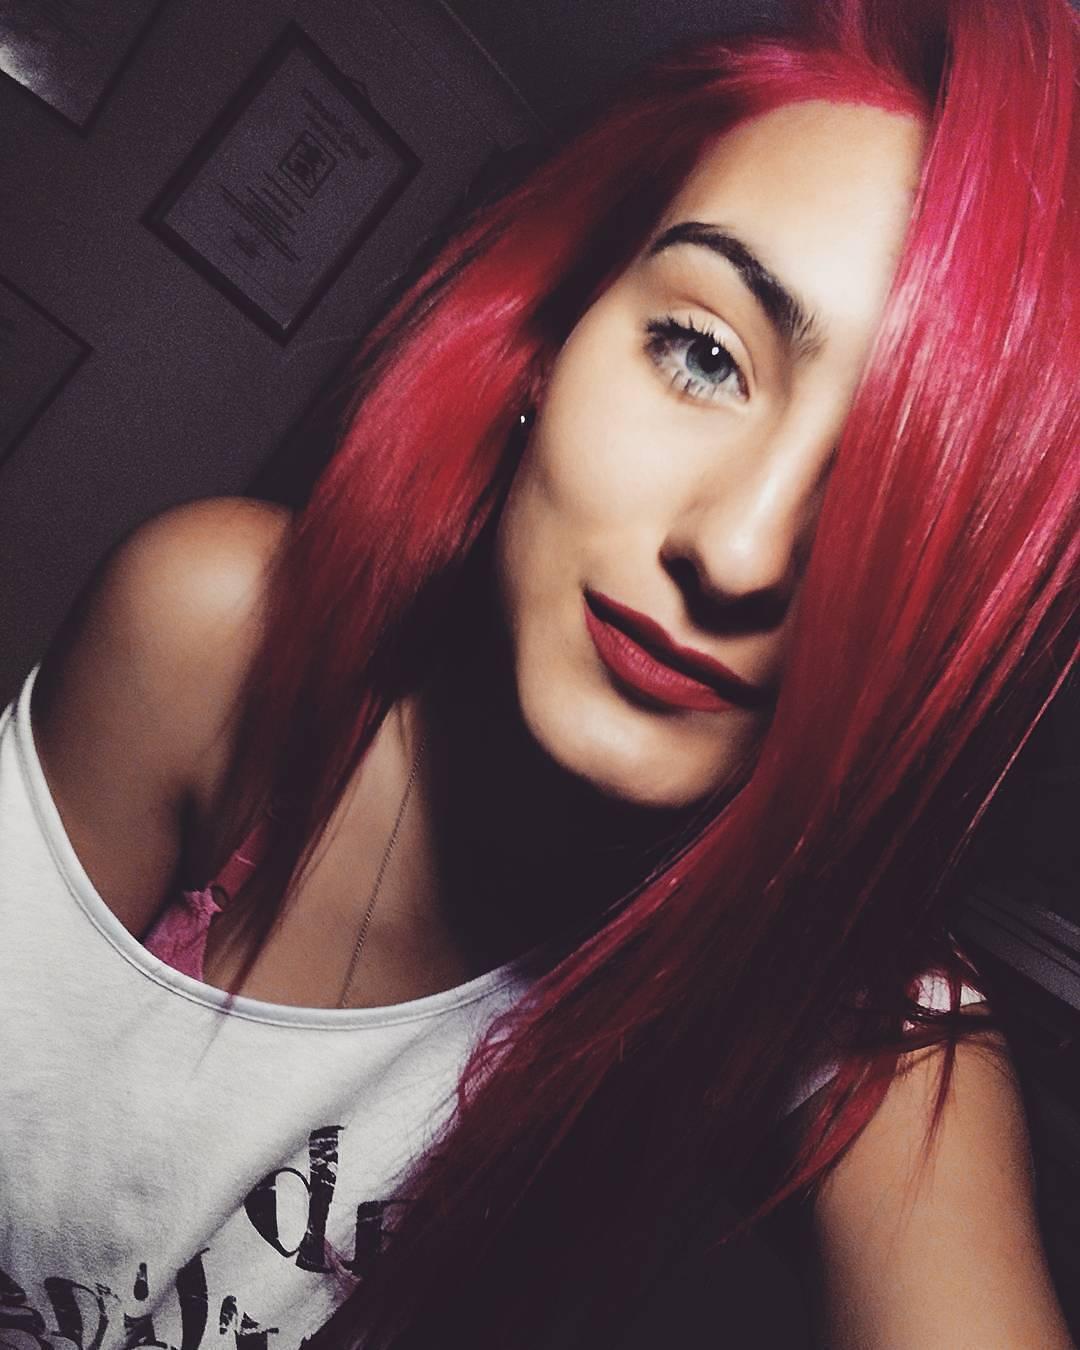 pink hair, red lipstick